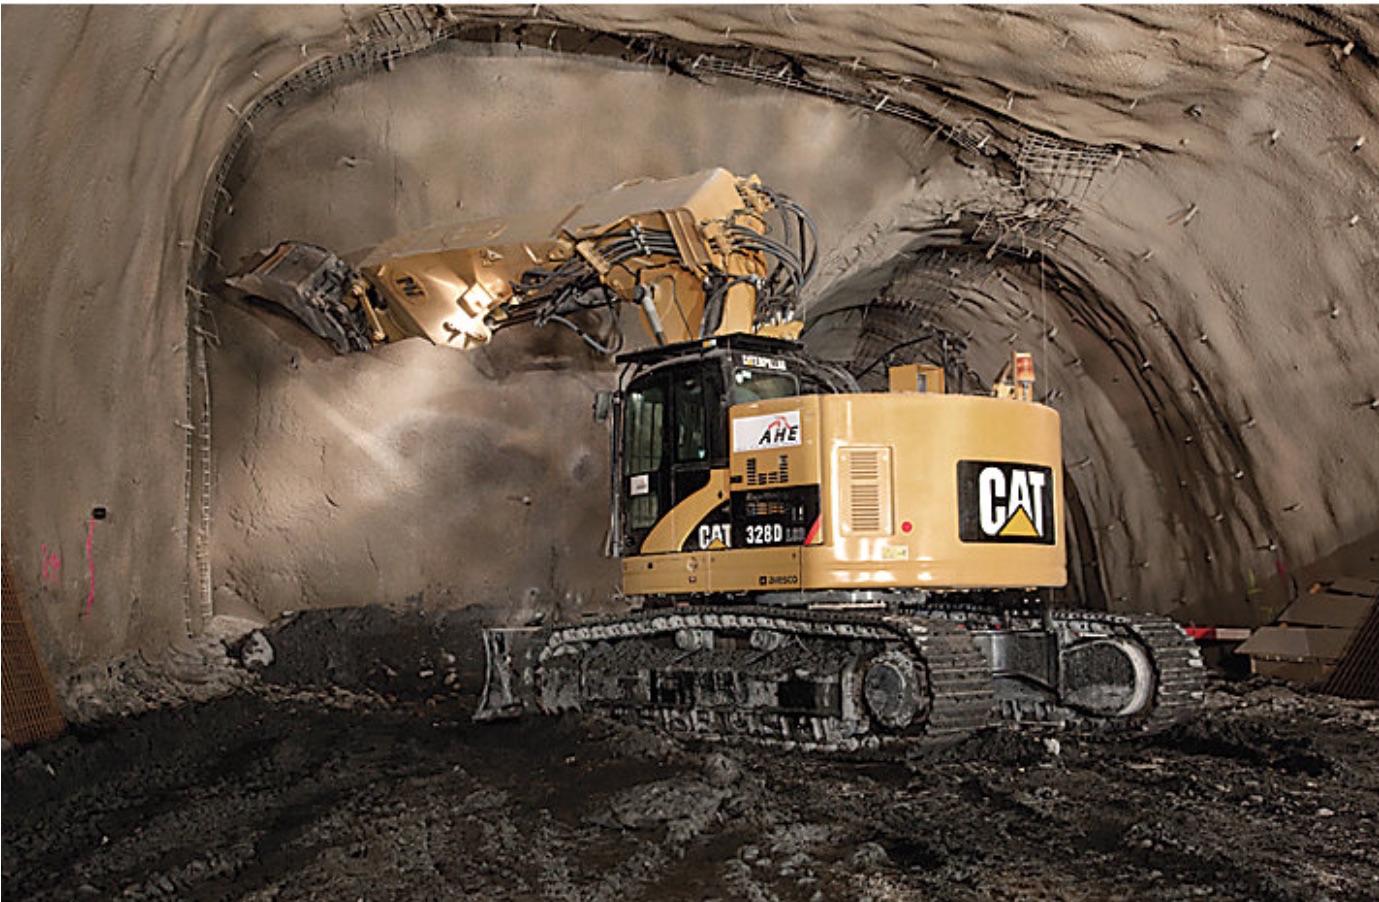 ZEPPELIN TRA MINIERE E GALLERIE - Perforare - GALLERIE miniere ZEPPELIN - Industria estrattiva-mineraria News